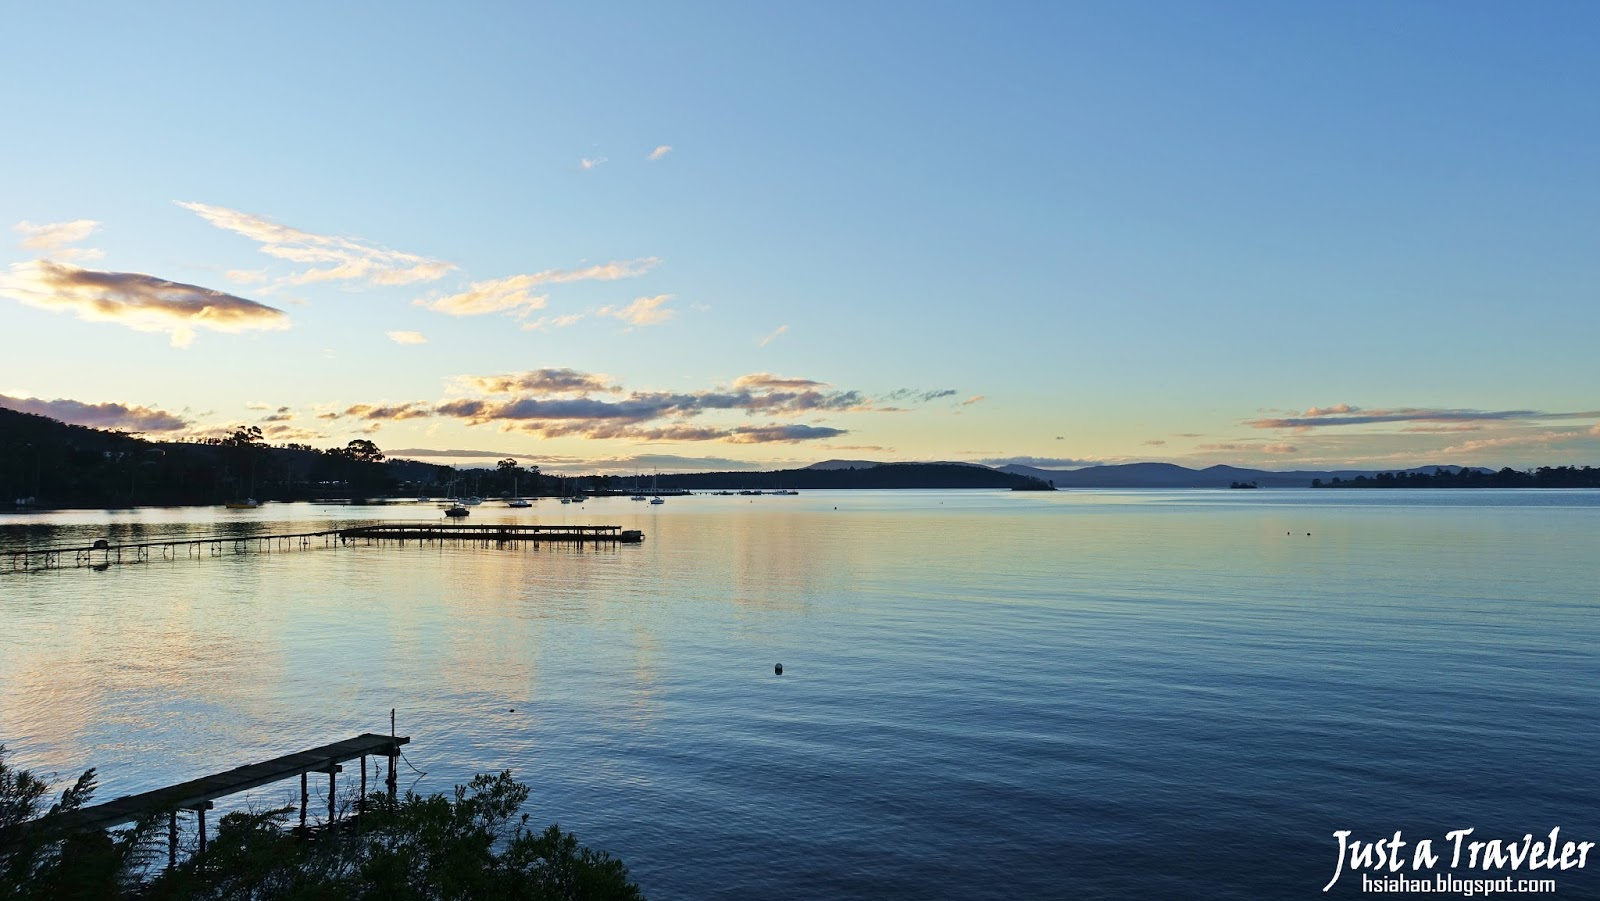 塔斯馬尼亞-景點-推薦-湖泊-Lake-旅遊-自由行-澳洲-Tasmania-Tourist-Attraction-Travel-Australia